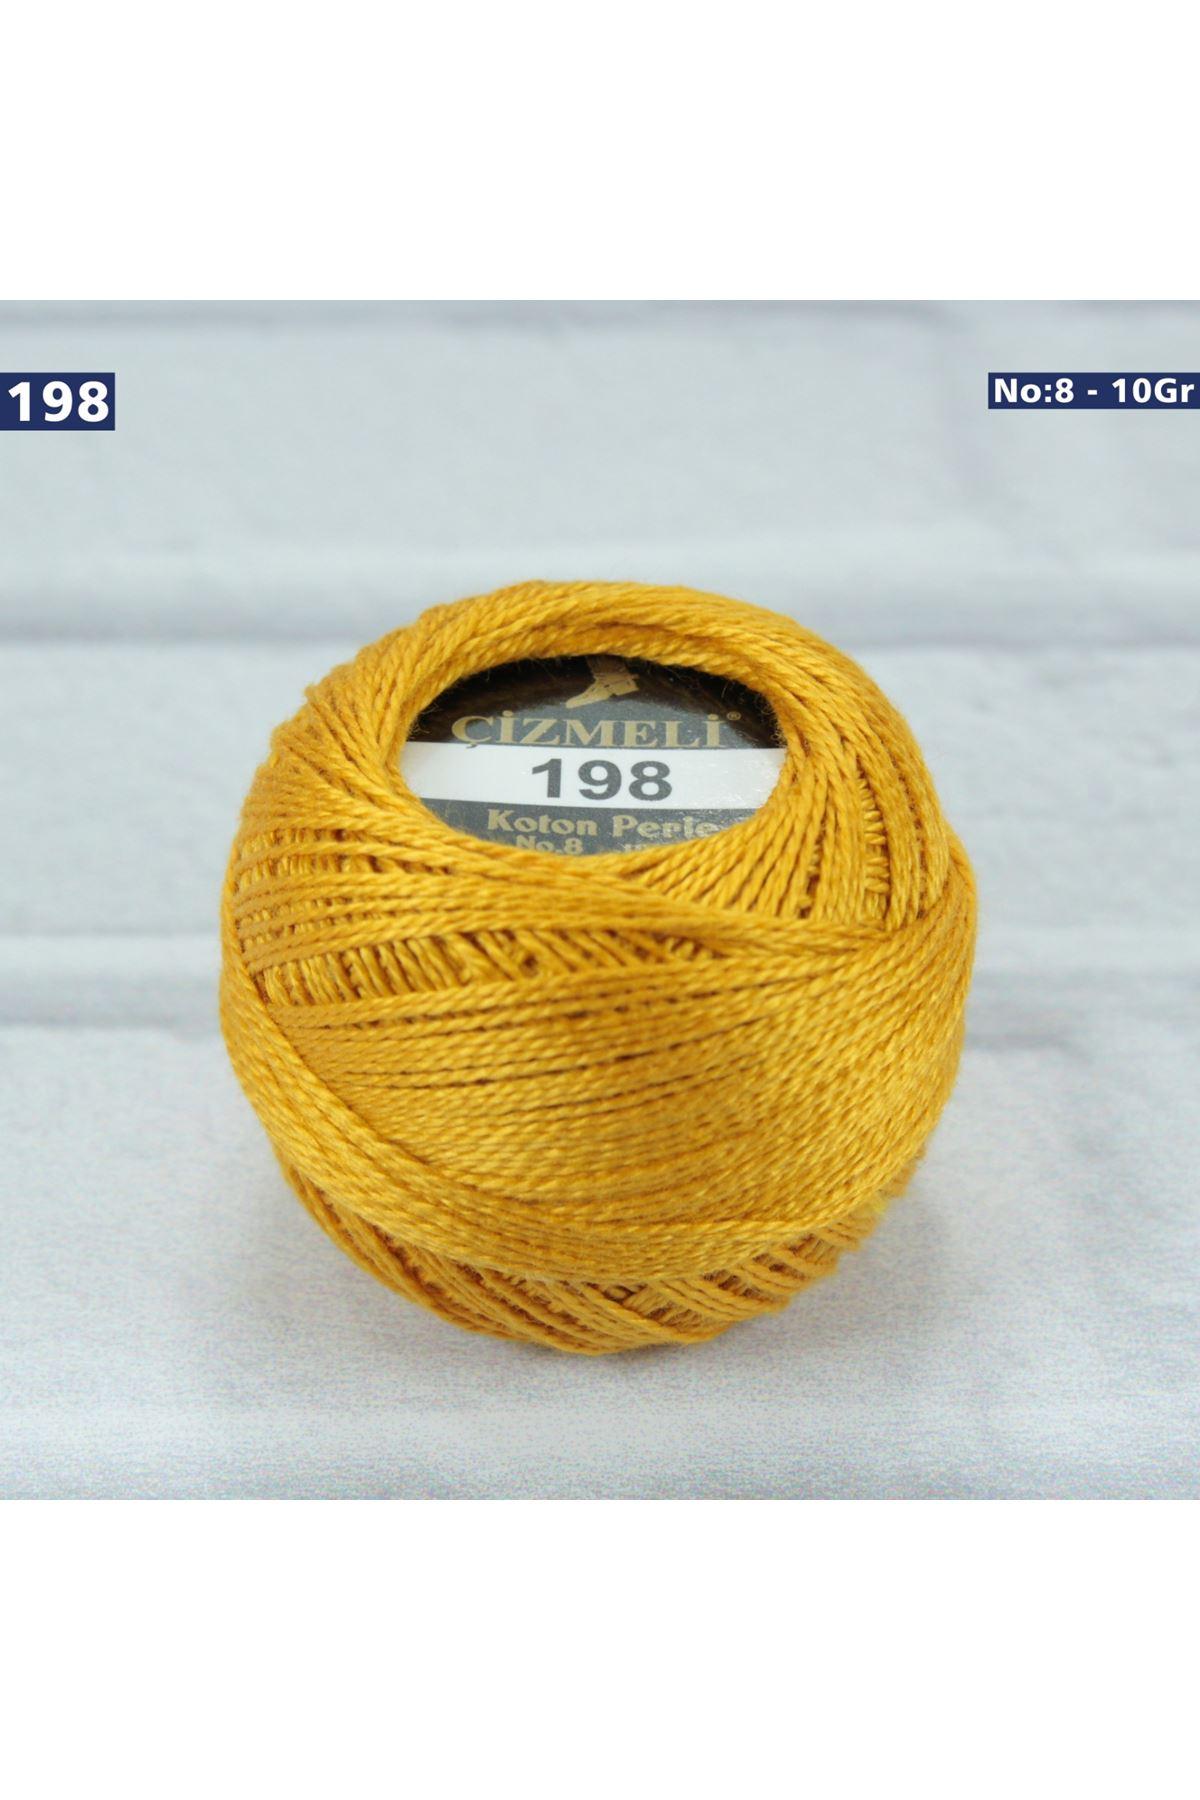 Çizmeli Cotton Perle Nakış İpliği No: 198